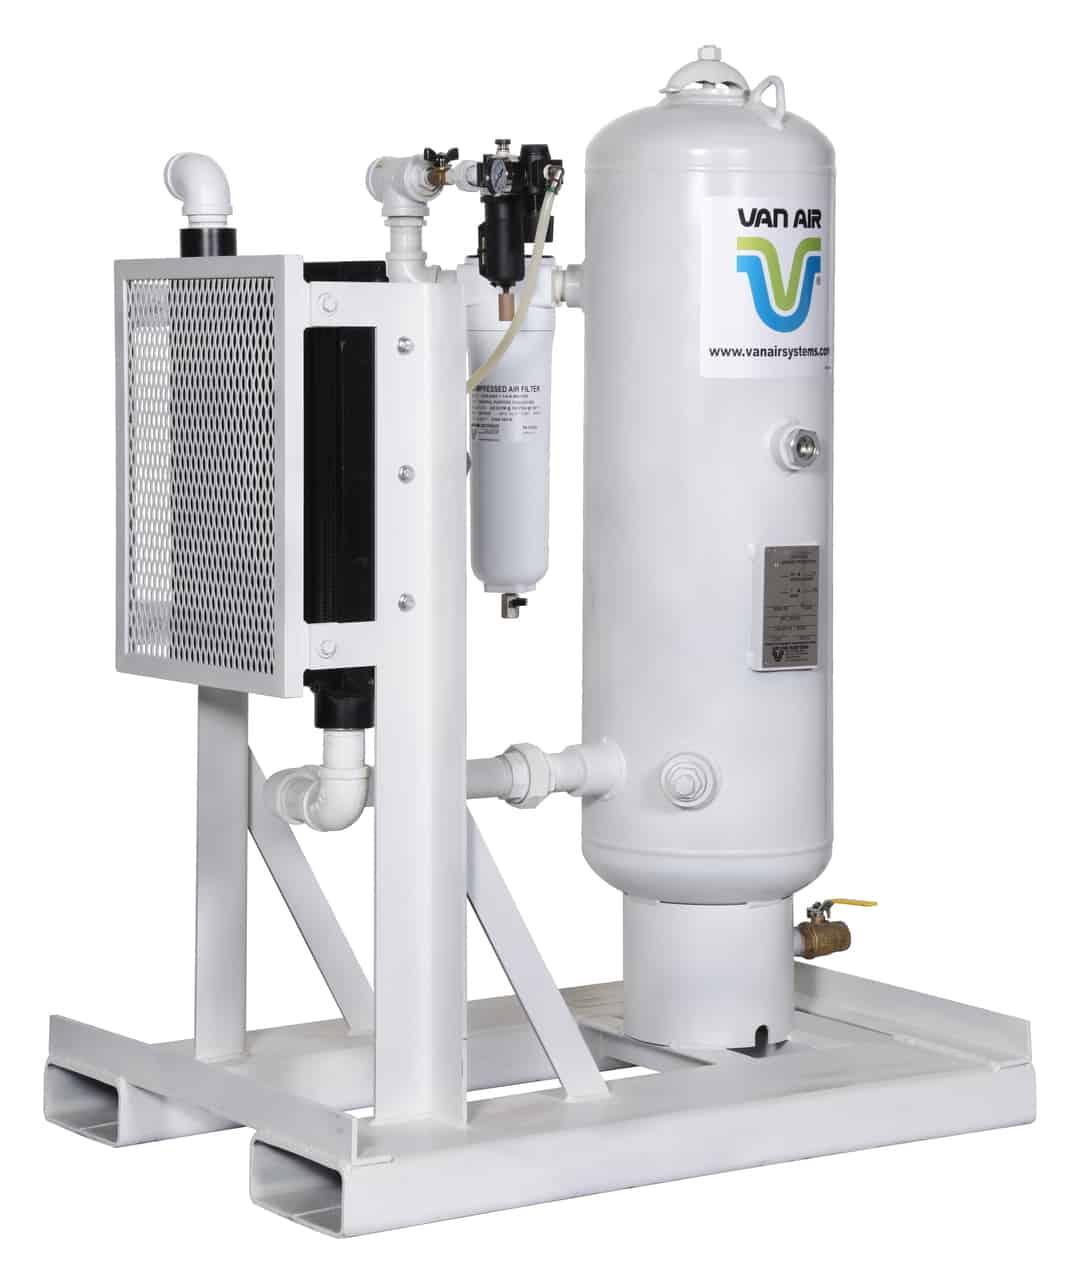 185 - 250 cfm Air After Cooler and Water Separator Rental in Calgary, Edmonton, Red Deer, Fort McMurray Alberta